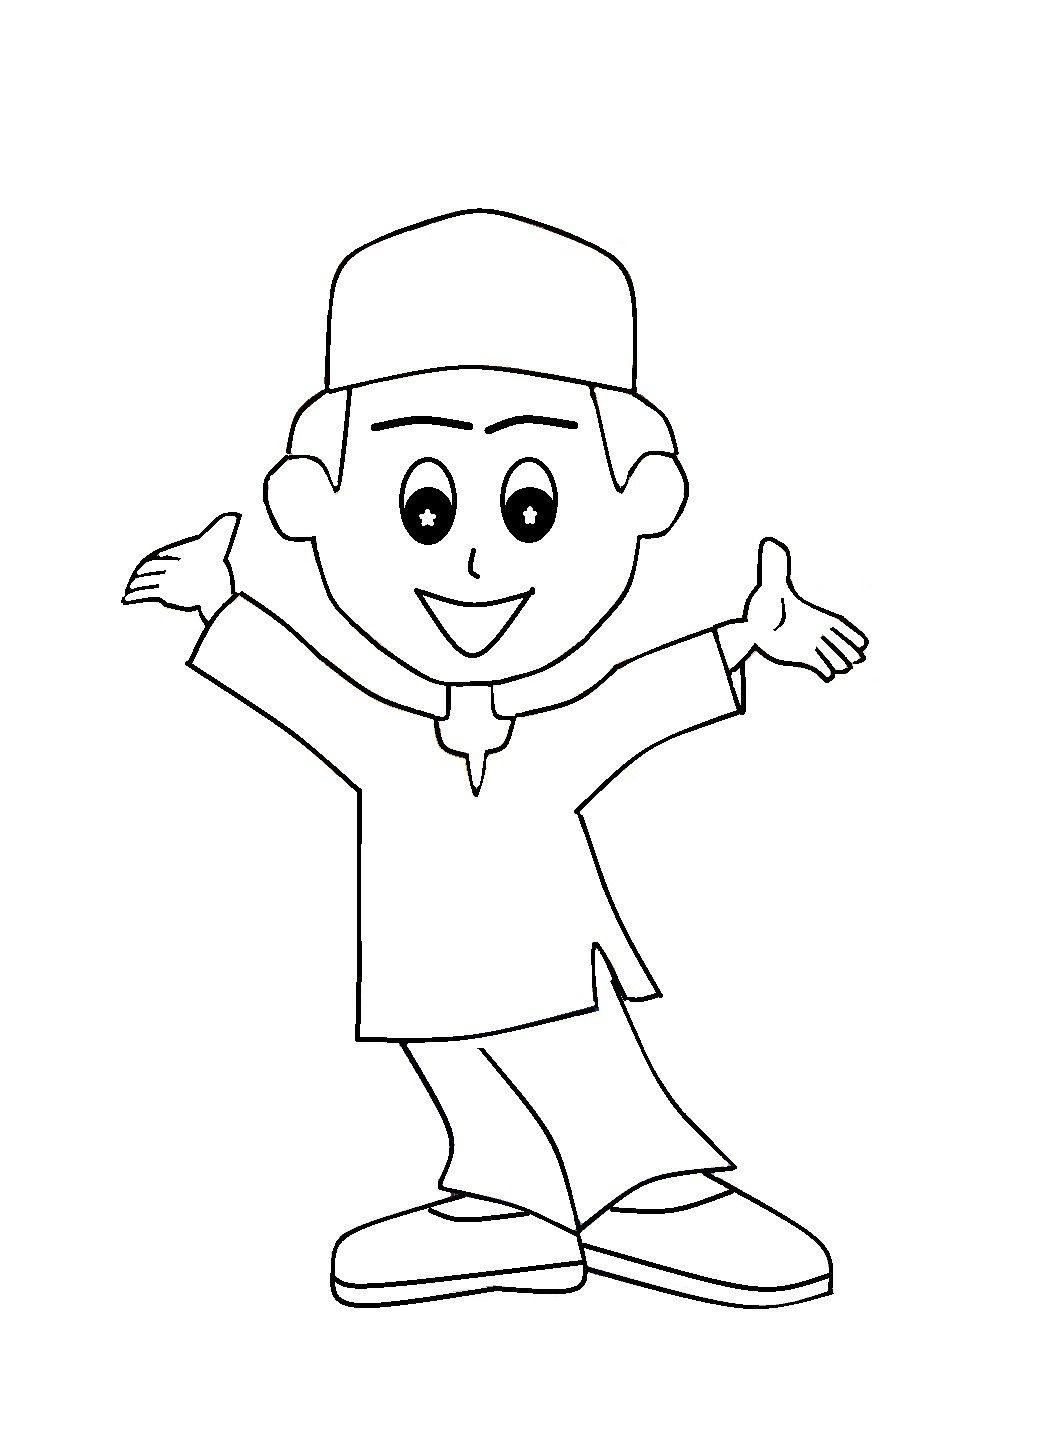 Mewarna Gambar Kartun Anak Muslim